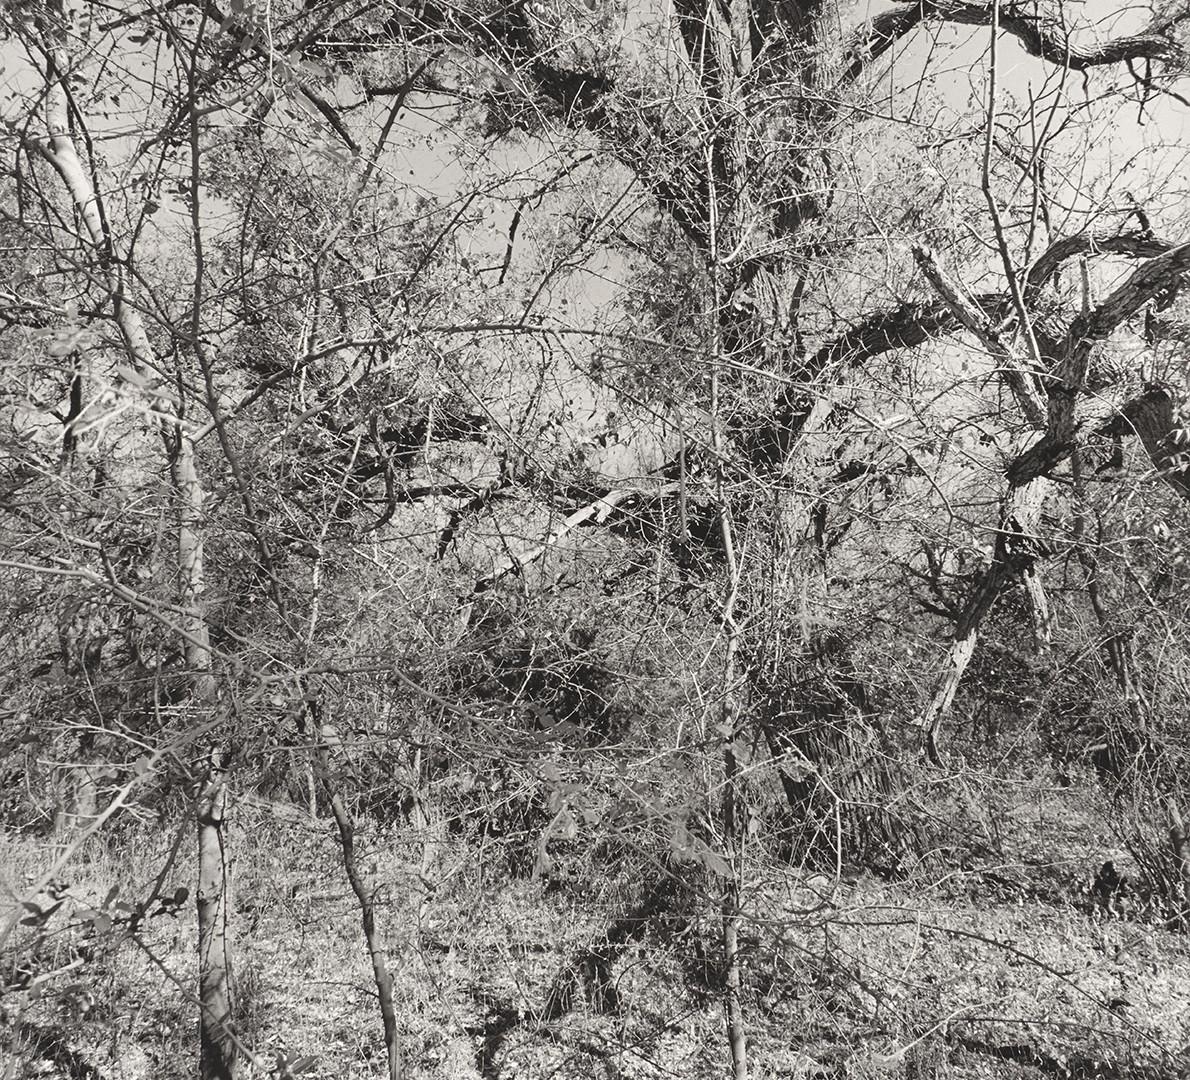 Lee Friedlander, Muleshoe Ranch Preserve, Arizona, 1999